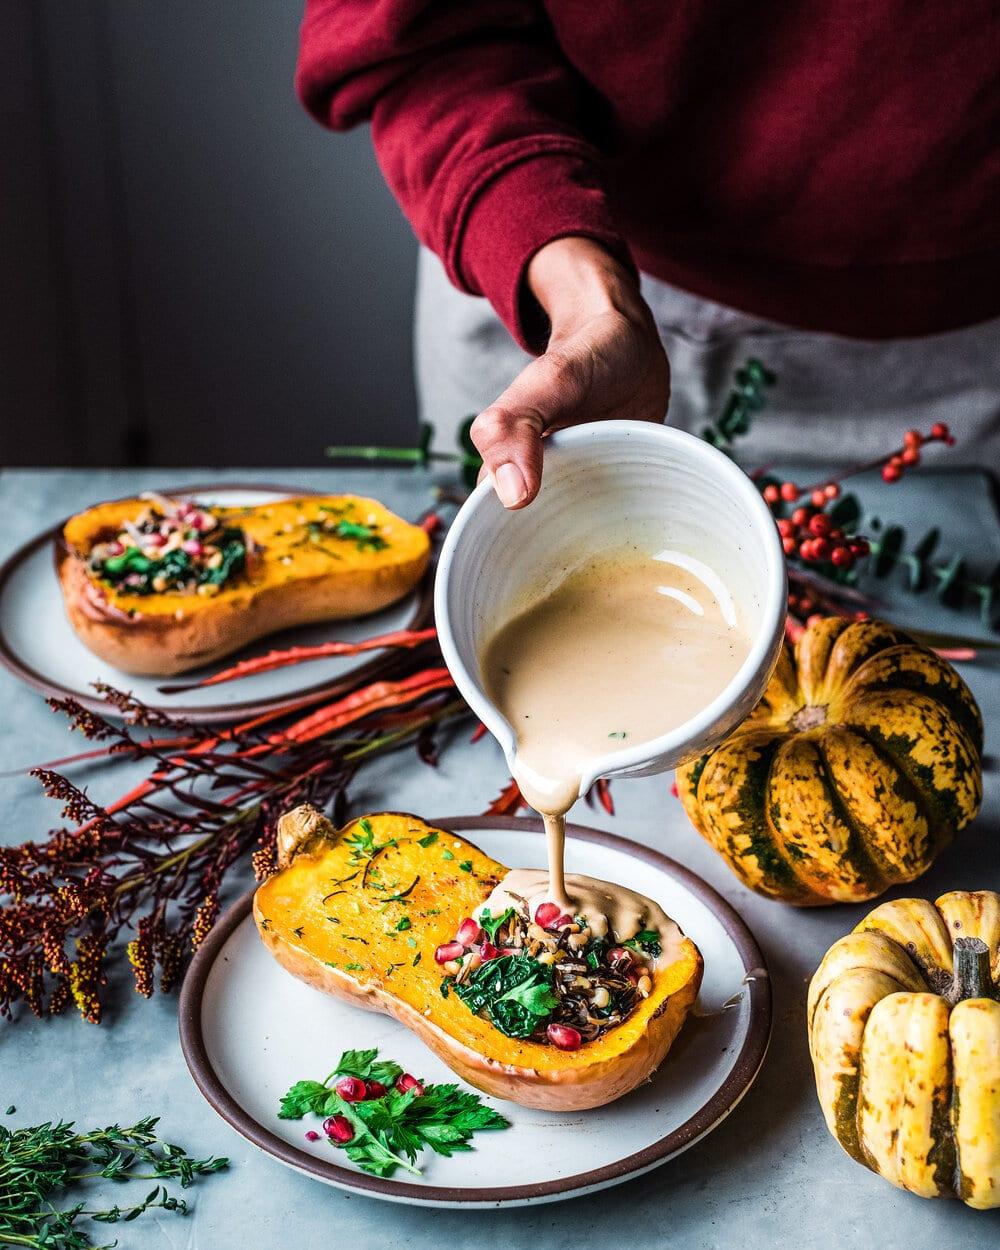 Vegan Wild Rice Stuffed Squash